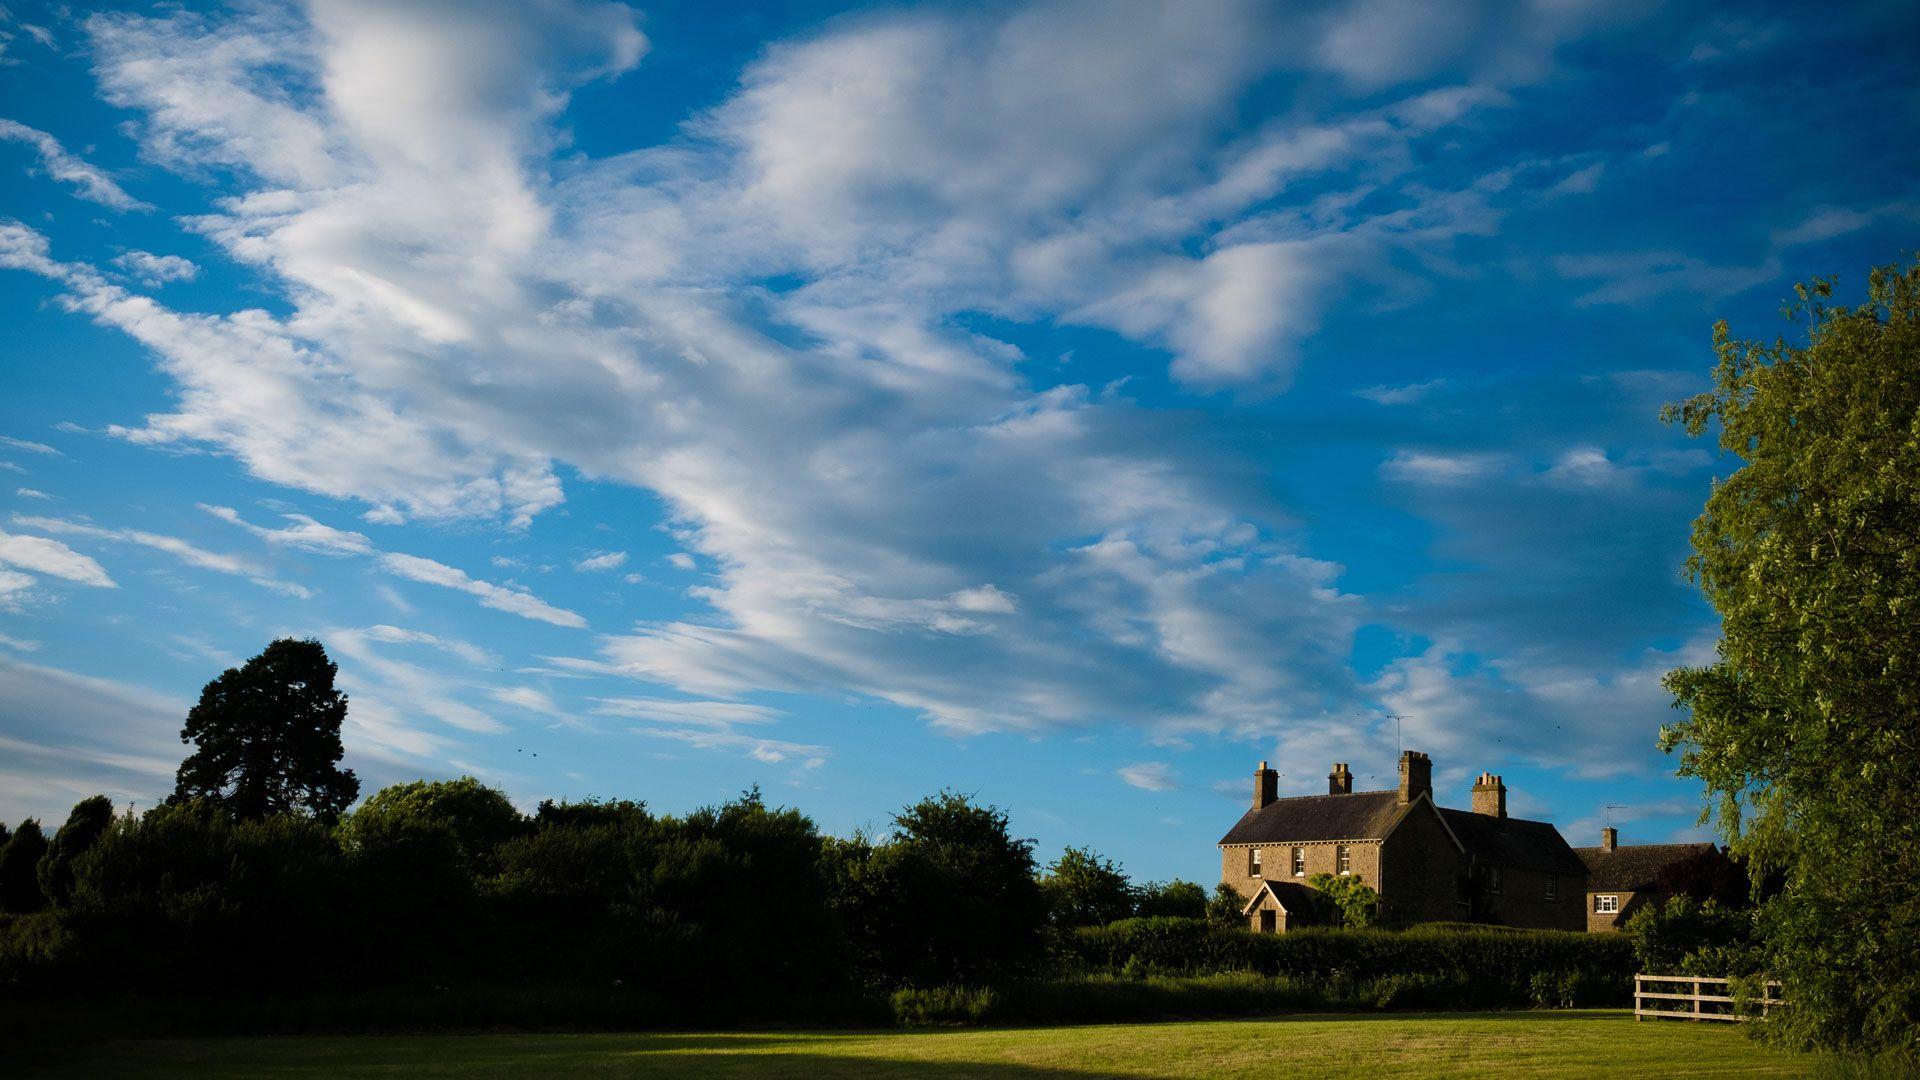 Merriscourt View - StayCotswold